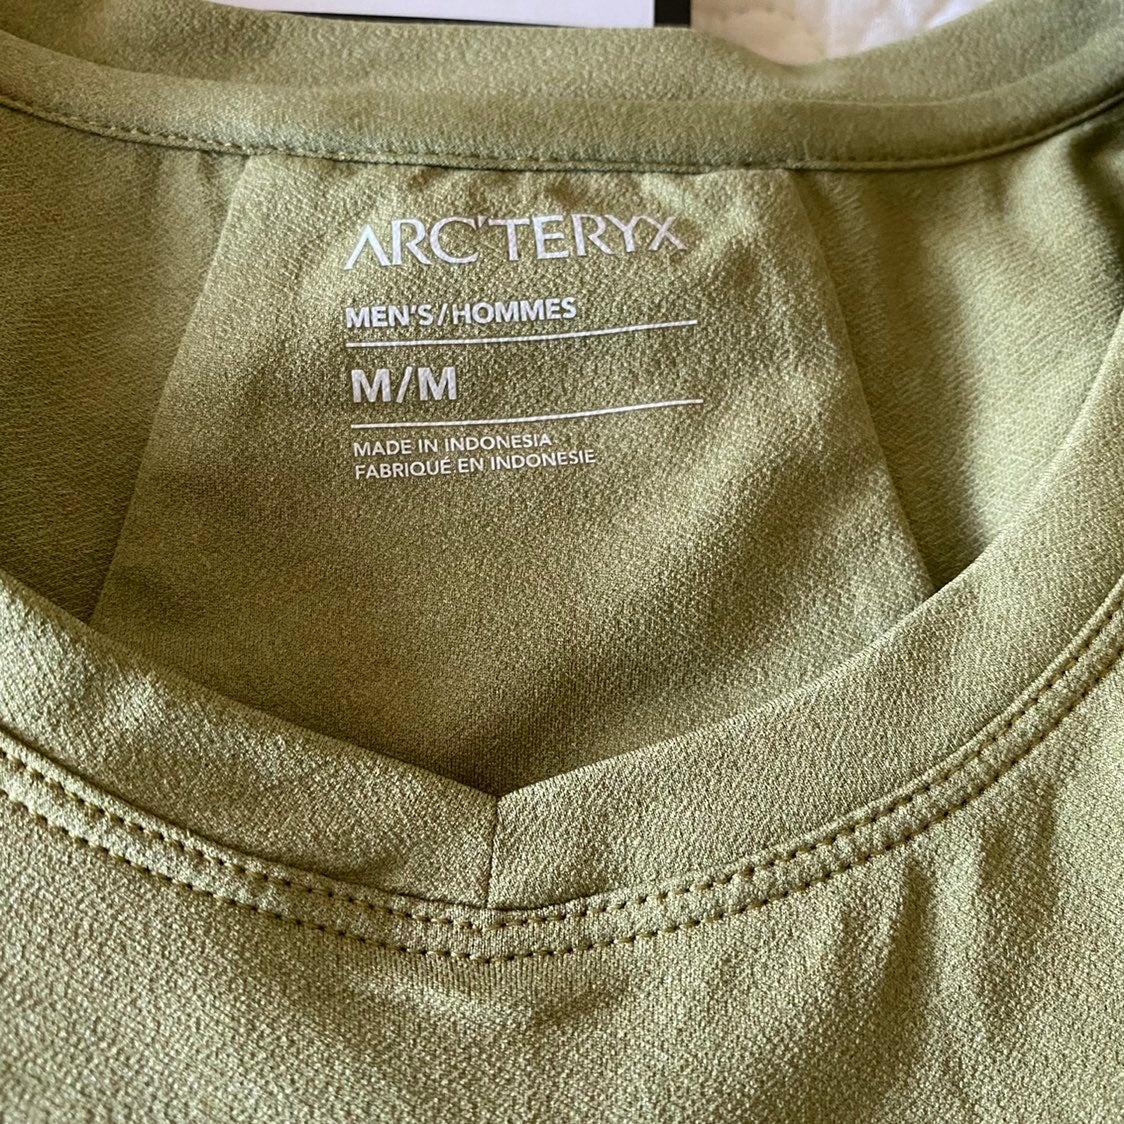 Arcteryx Men's Shirt